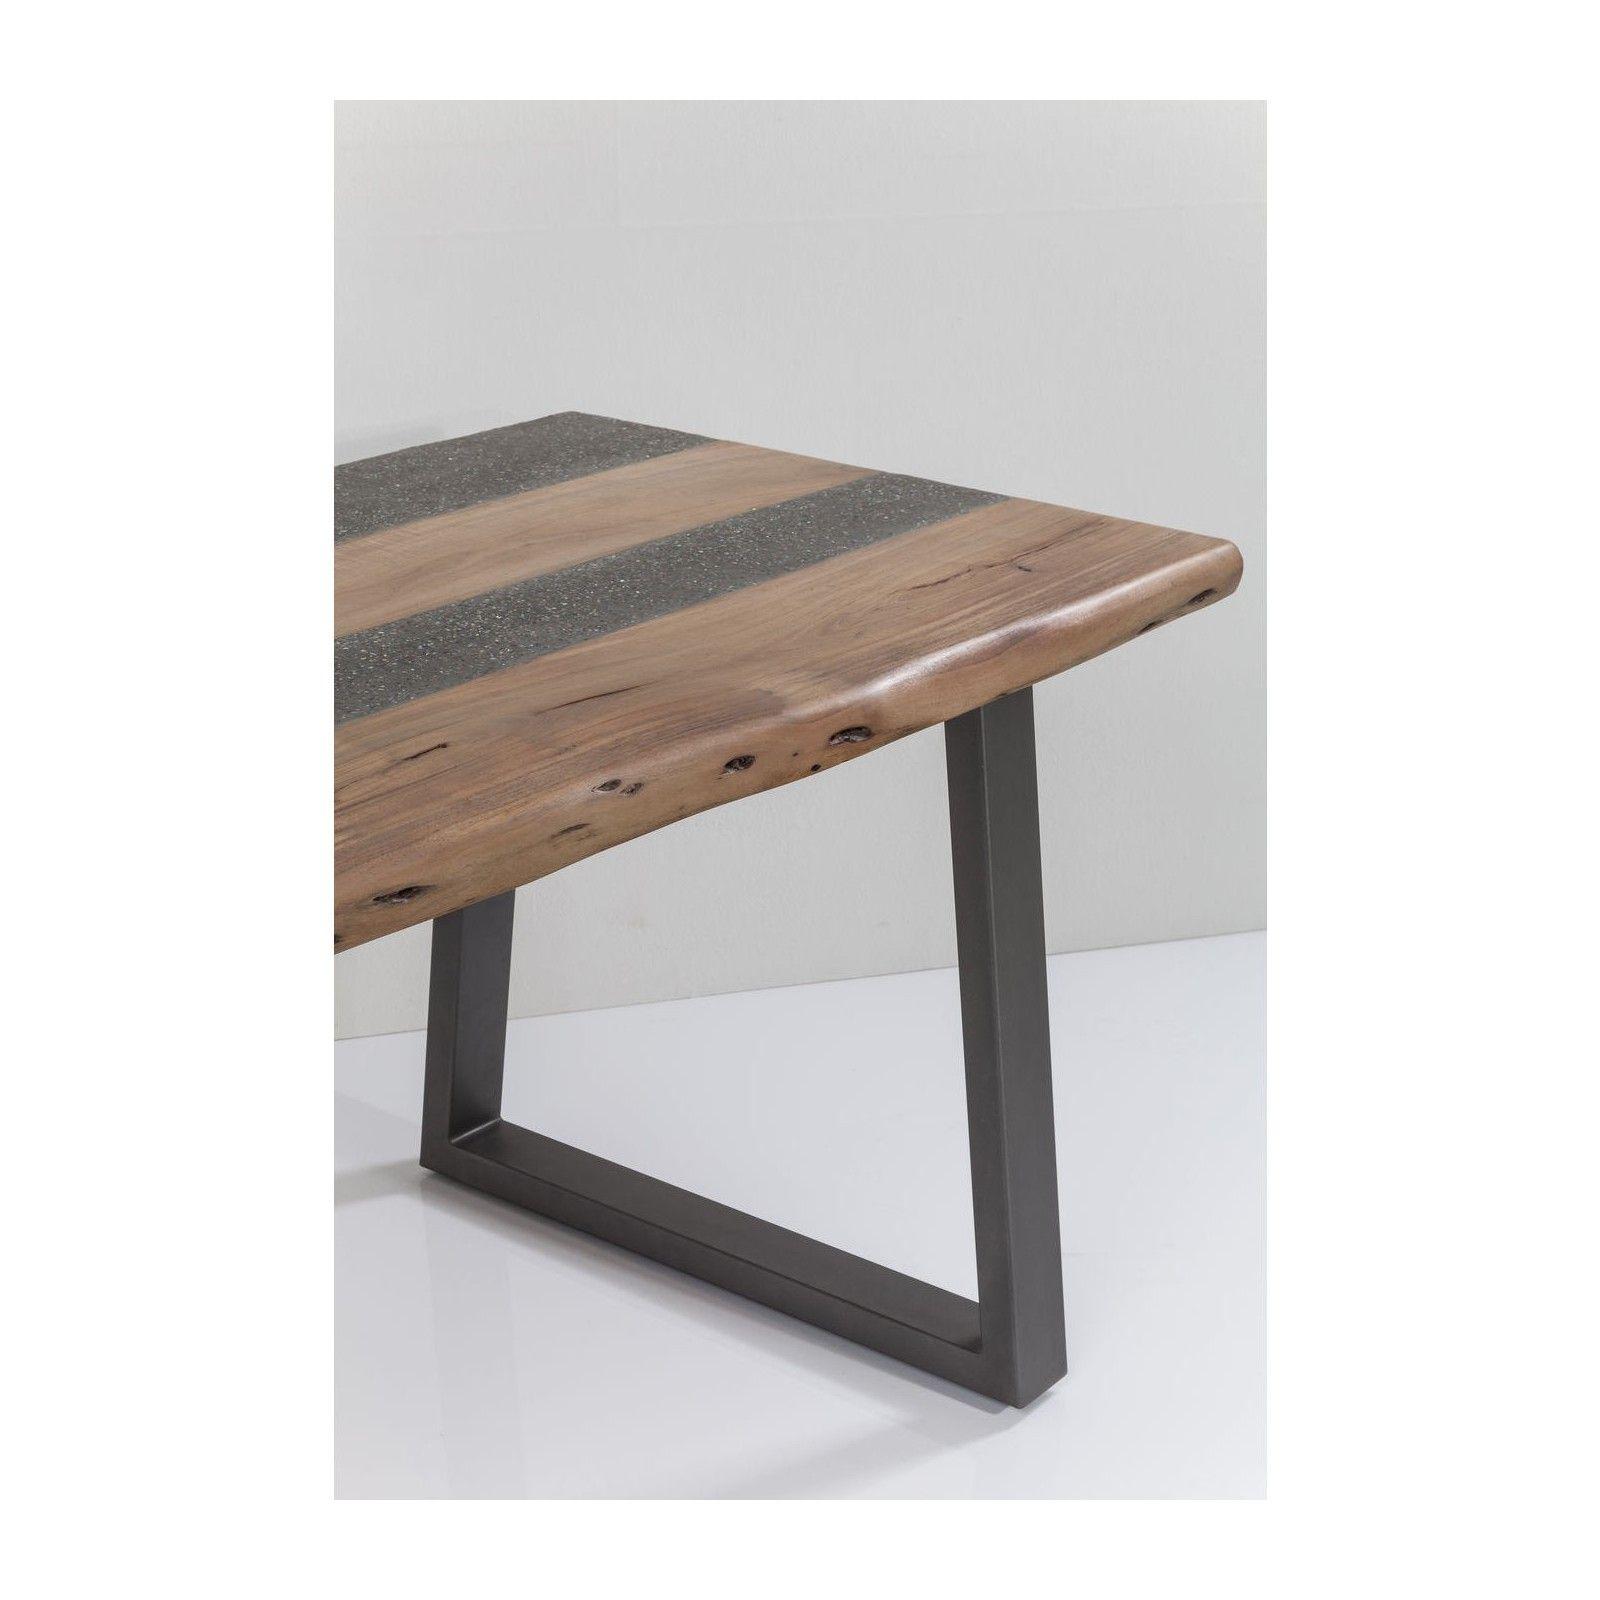 Kare Click table tarrazzo 160x80 kare design kare click inspiration pour